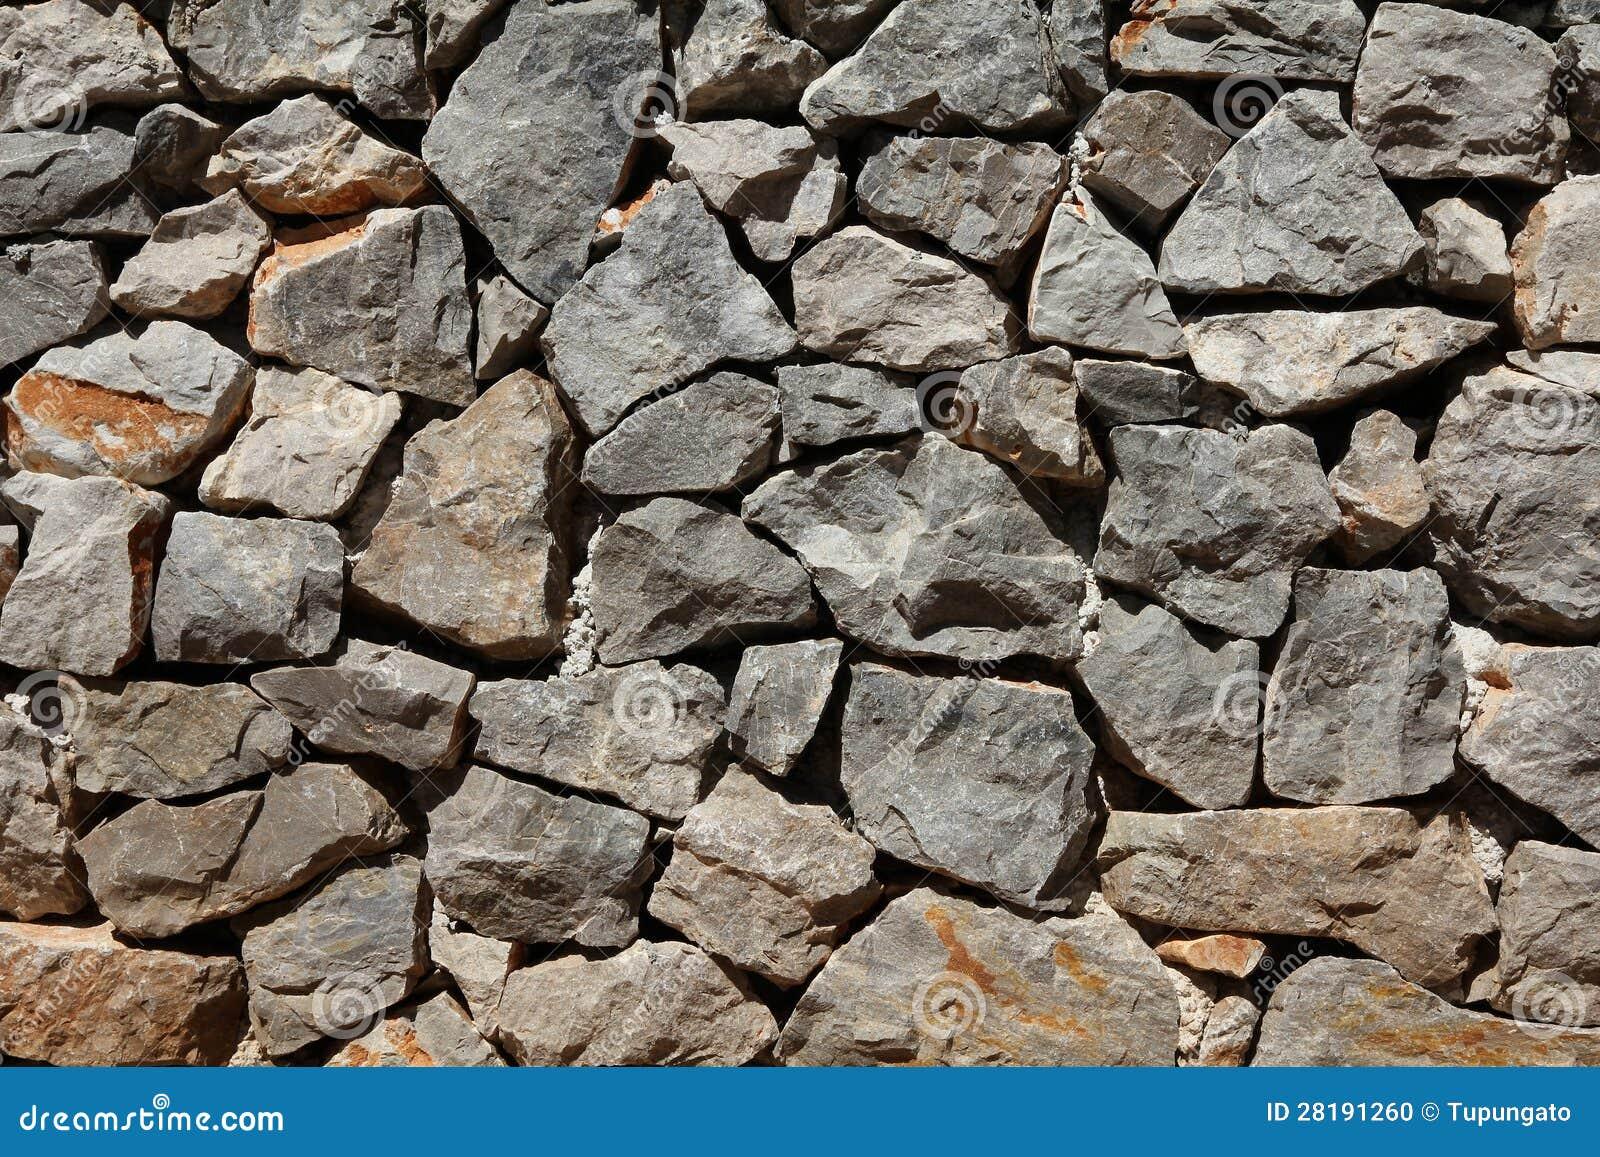 Basalt And Granite : Basalt rock wall stock photo image of pattern